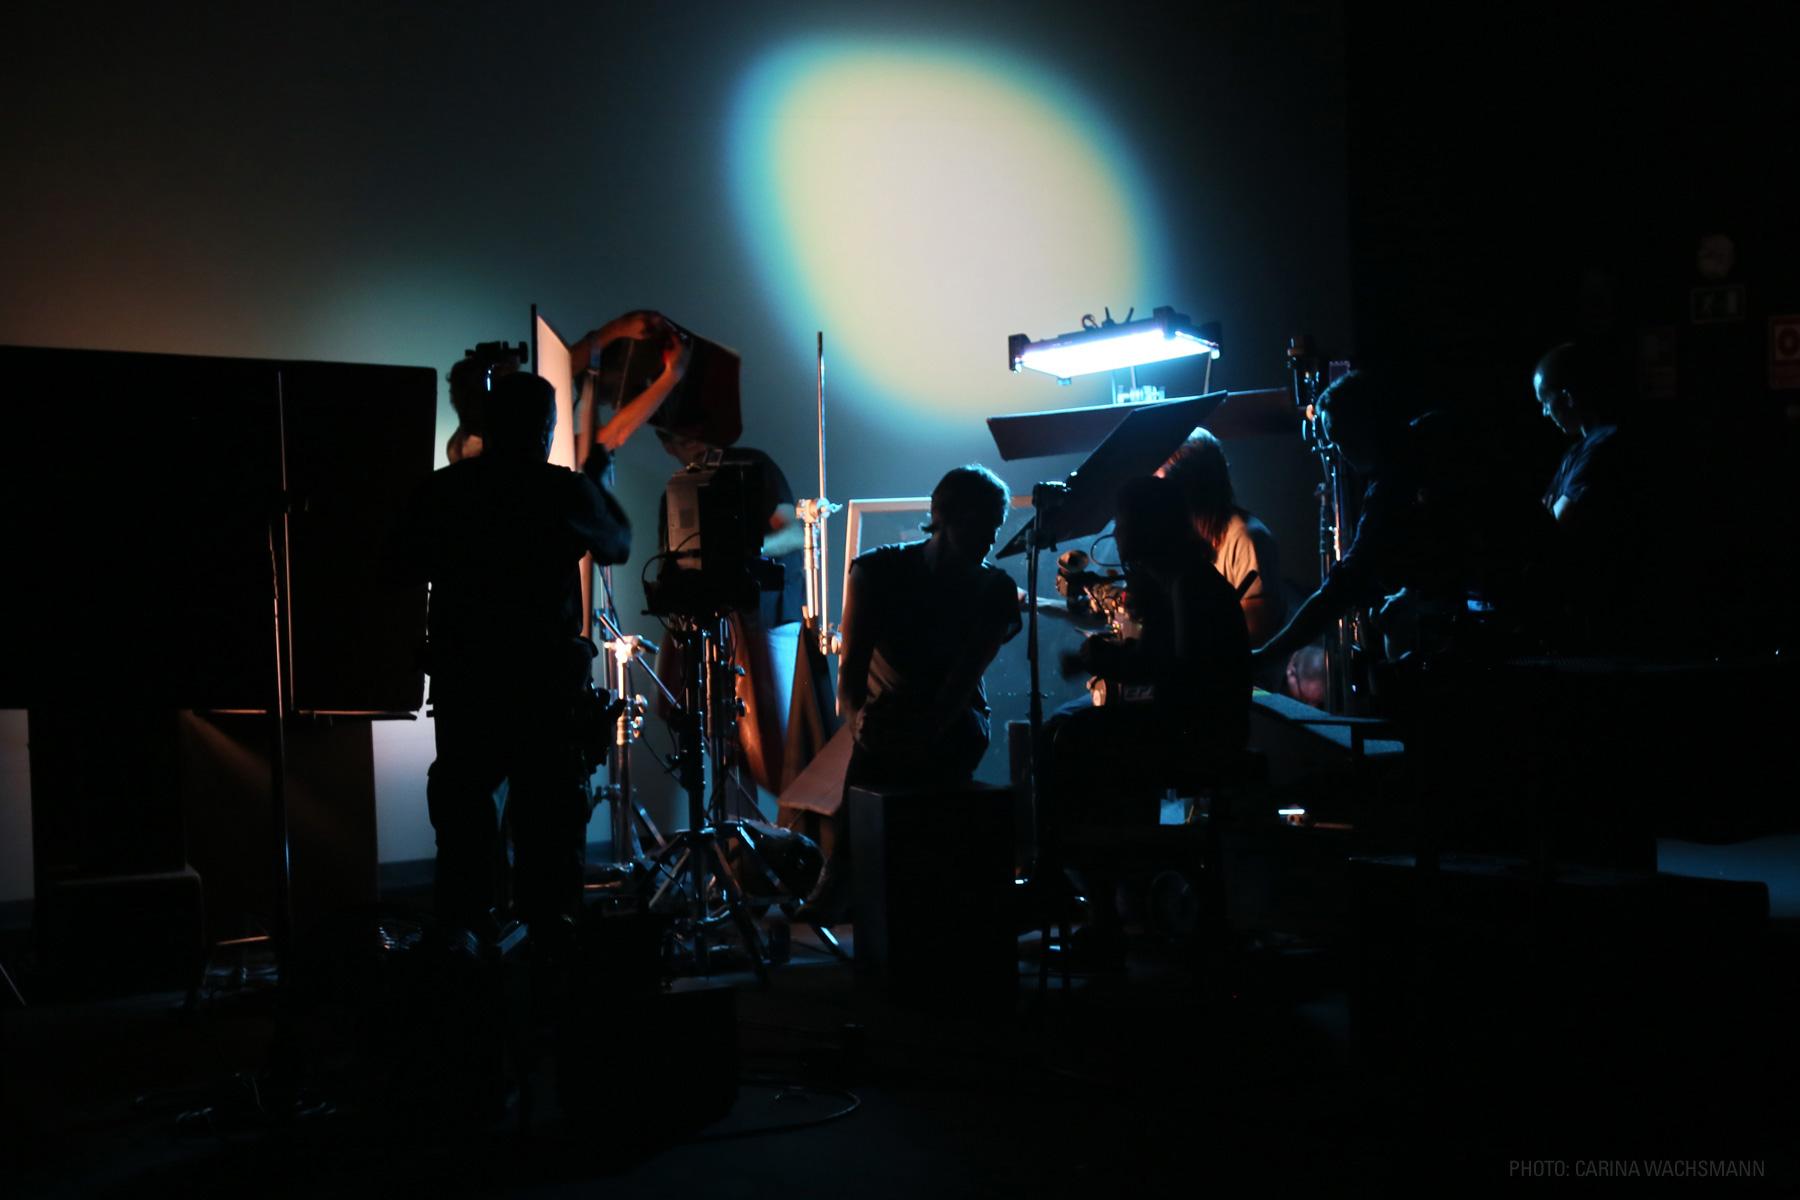 Pulsar2014-backstage-cw-26.jpg